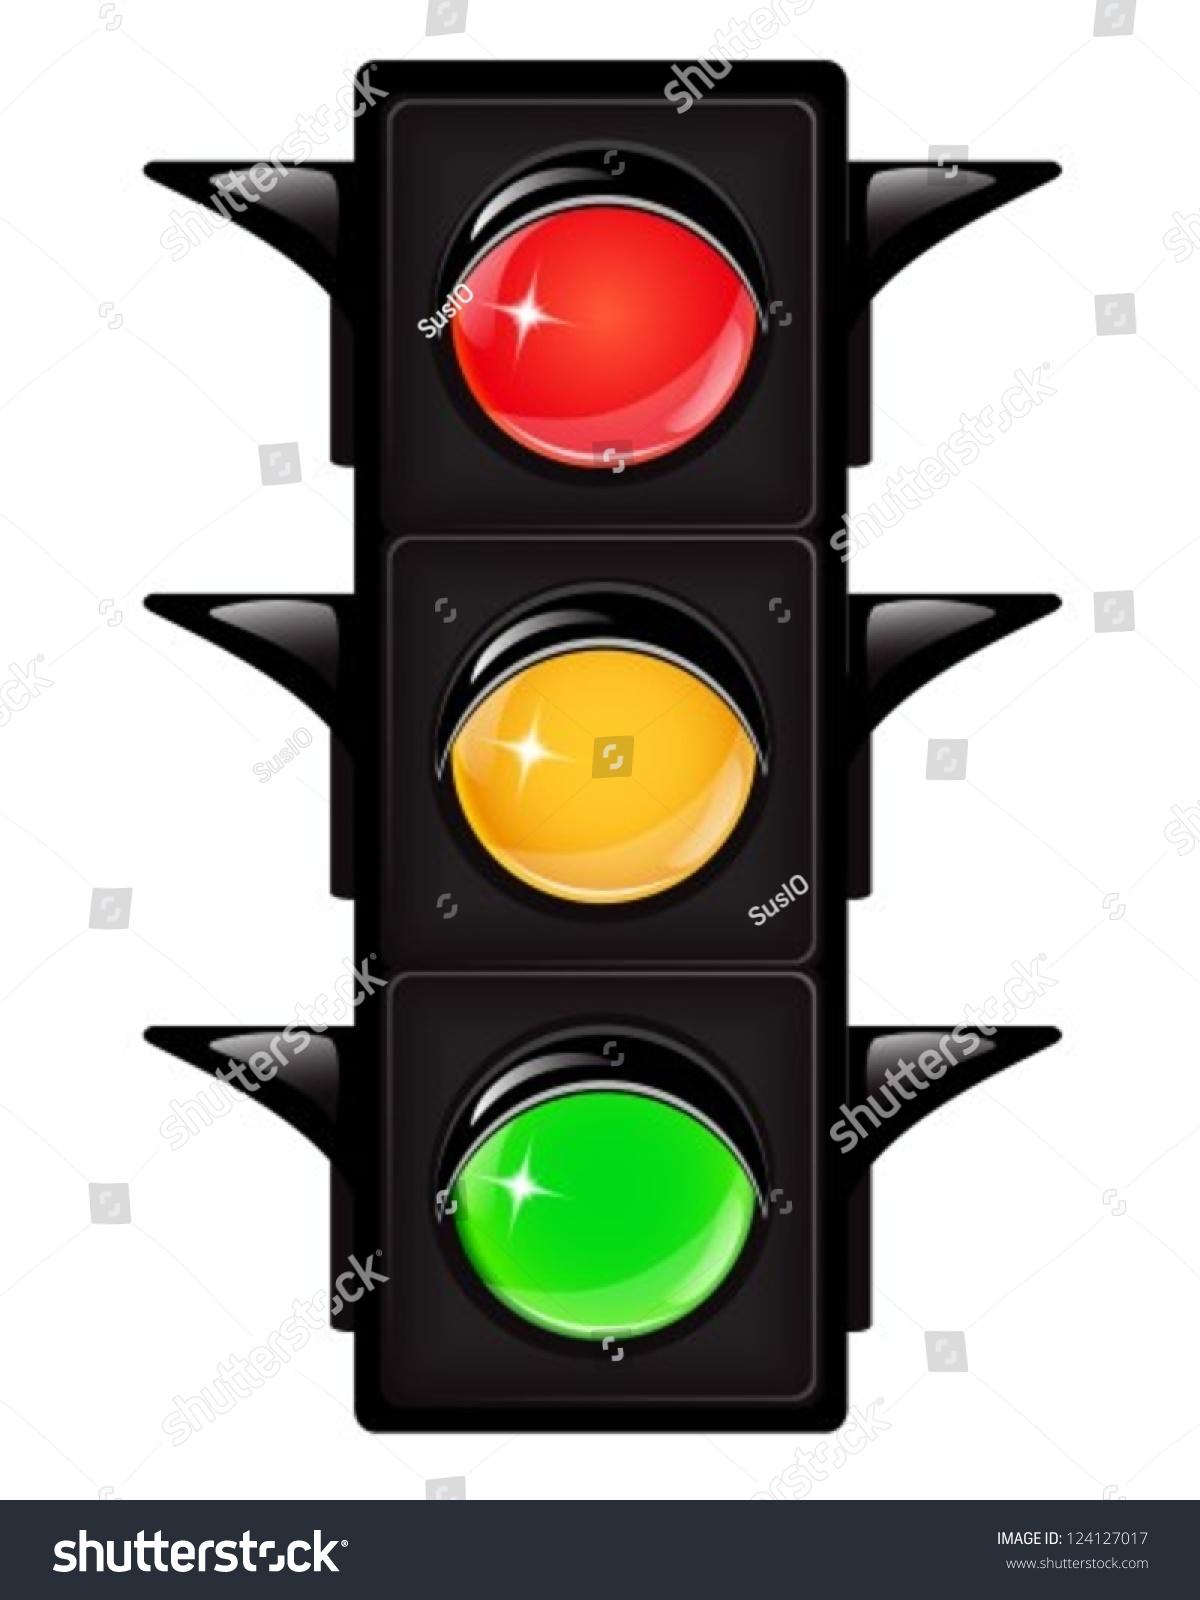 Black Traffic Light Reflections On White Stock Vector 124127017 ... for stop light black and white  111bof